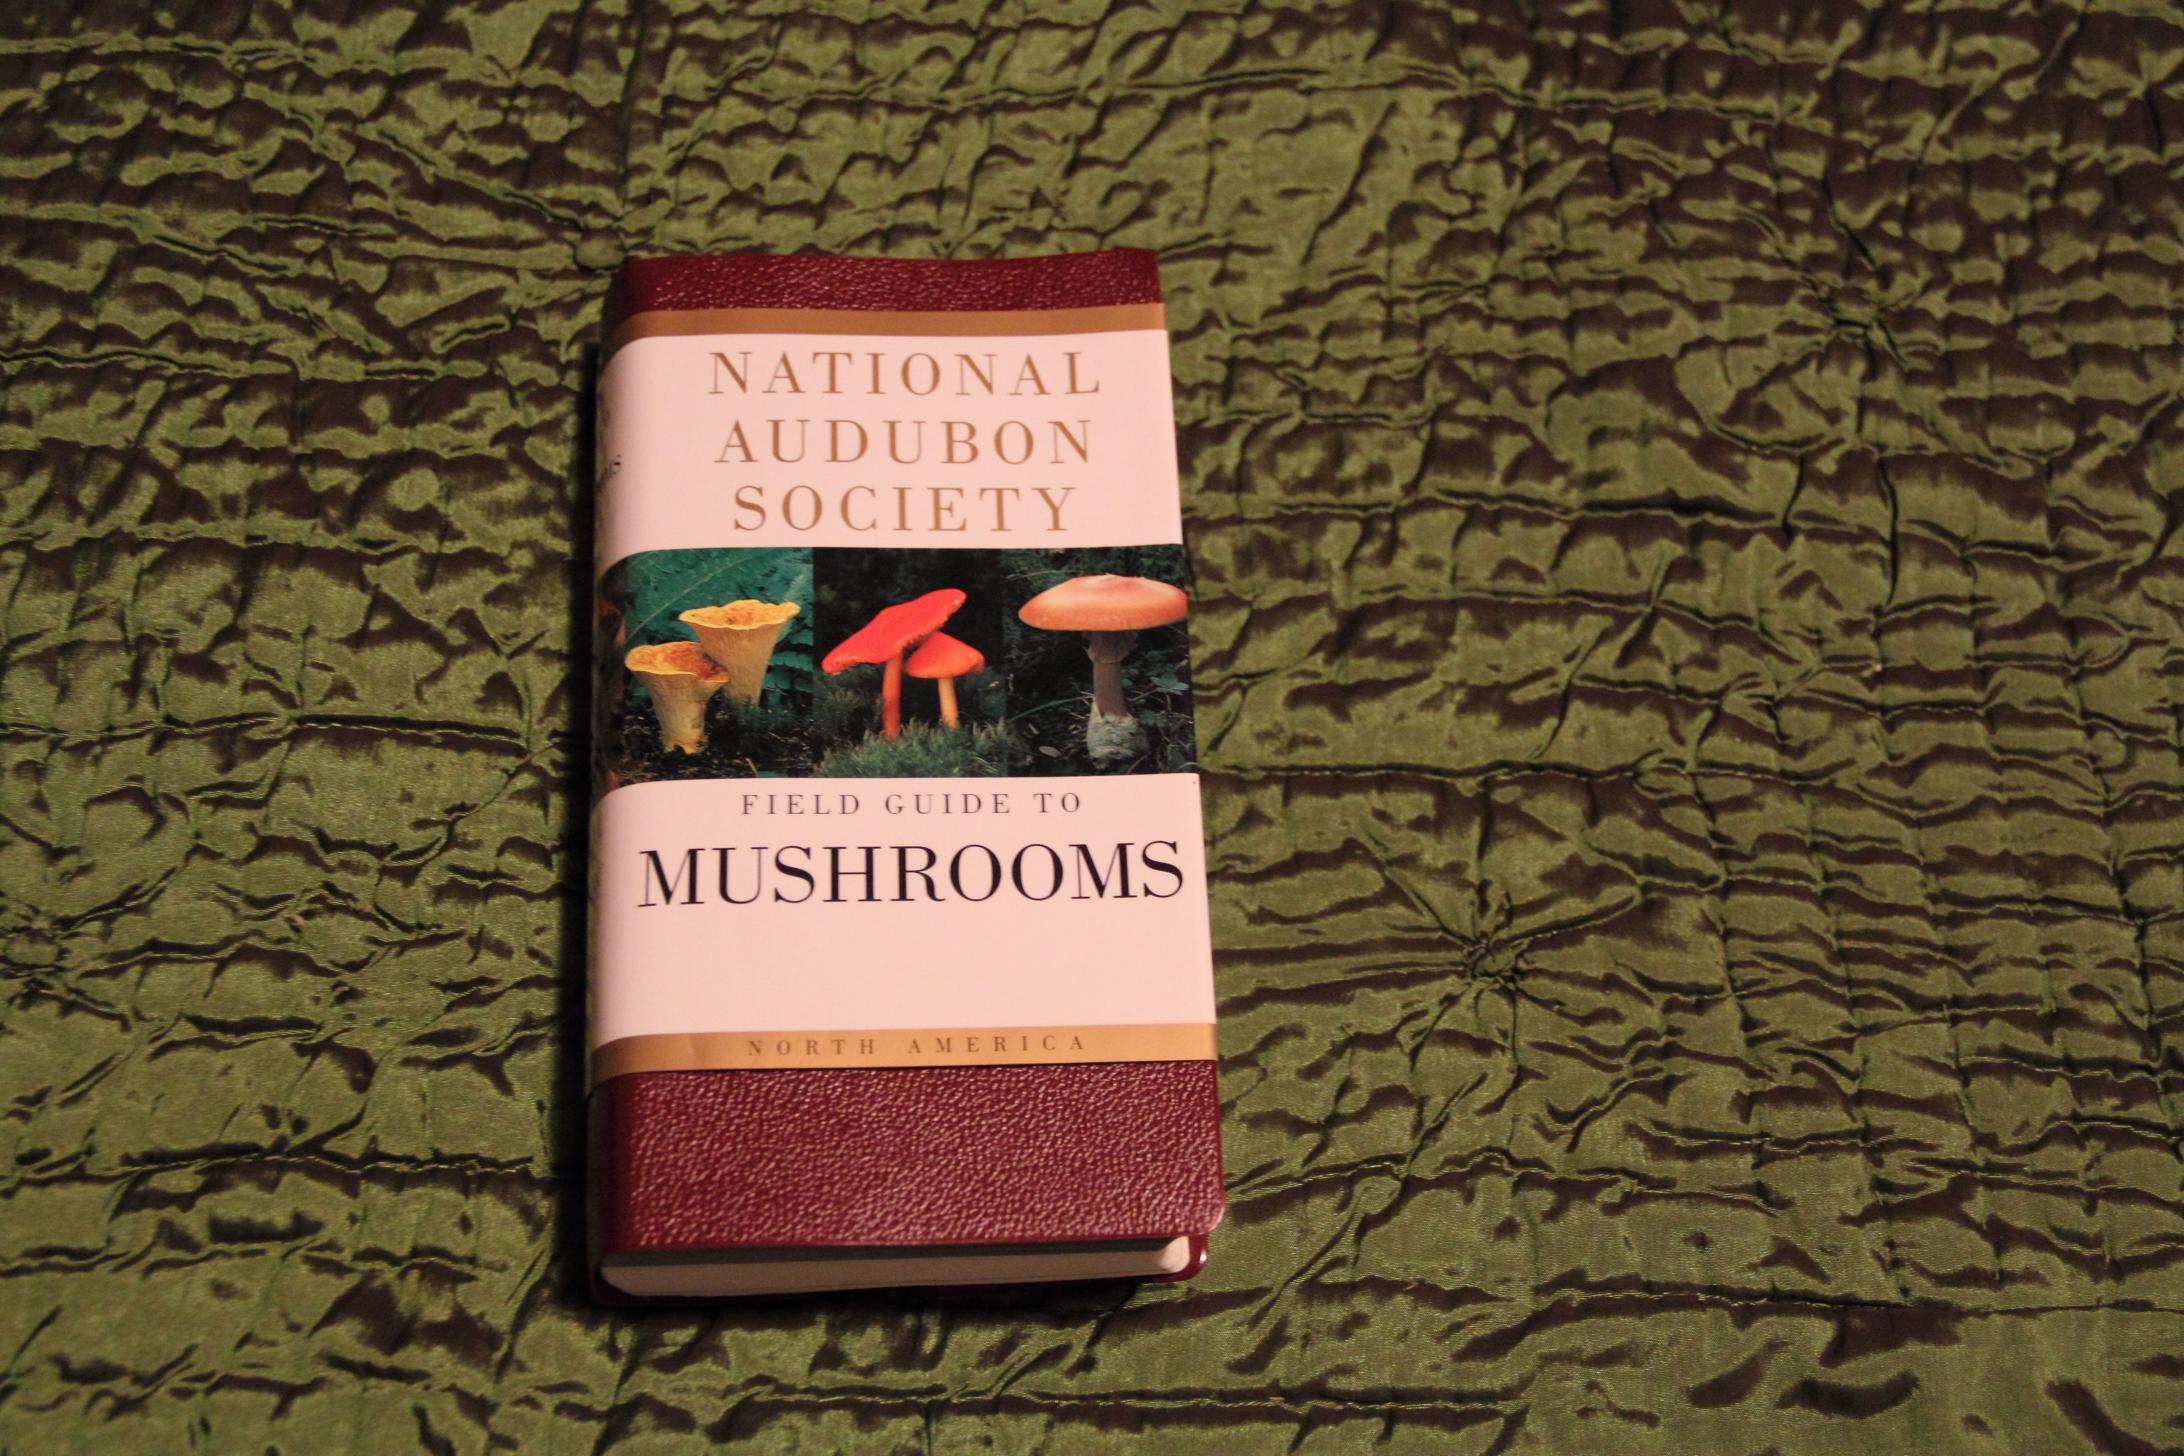 National Audubon Society Mushroom Guide Book rental in Traverse City, MI